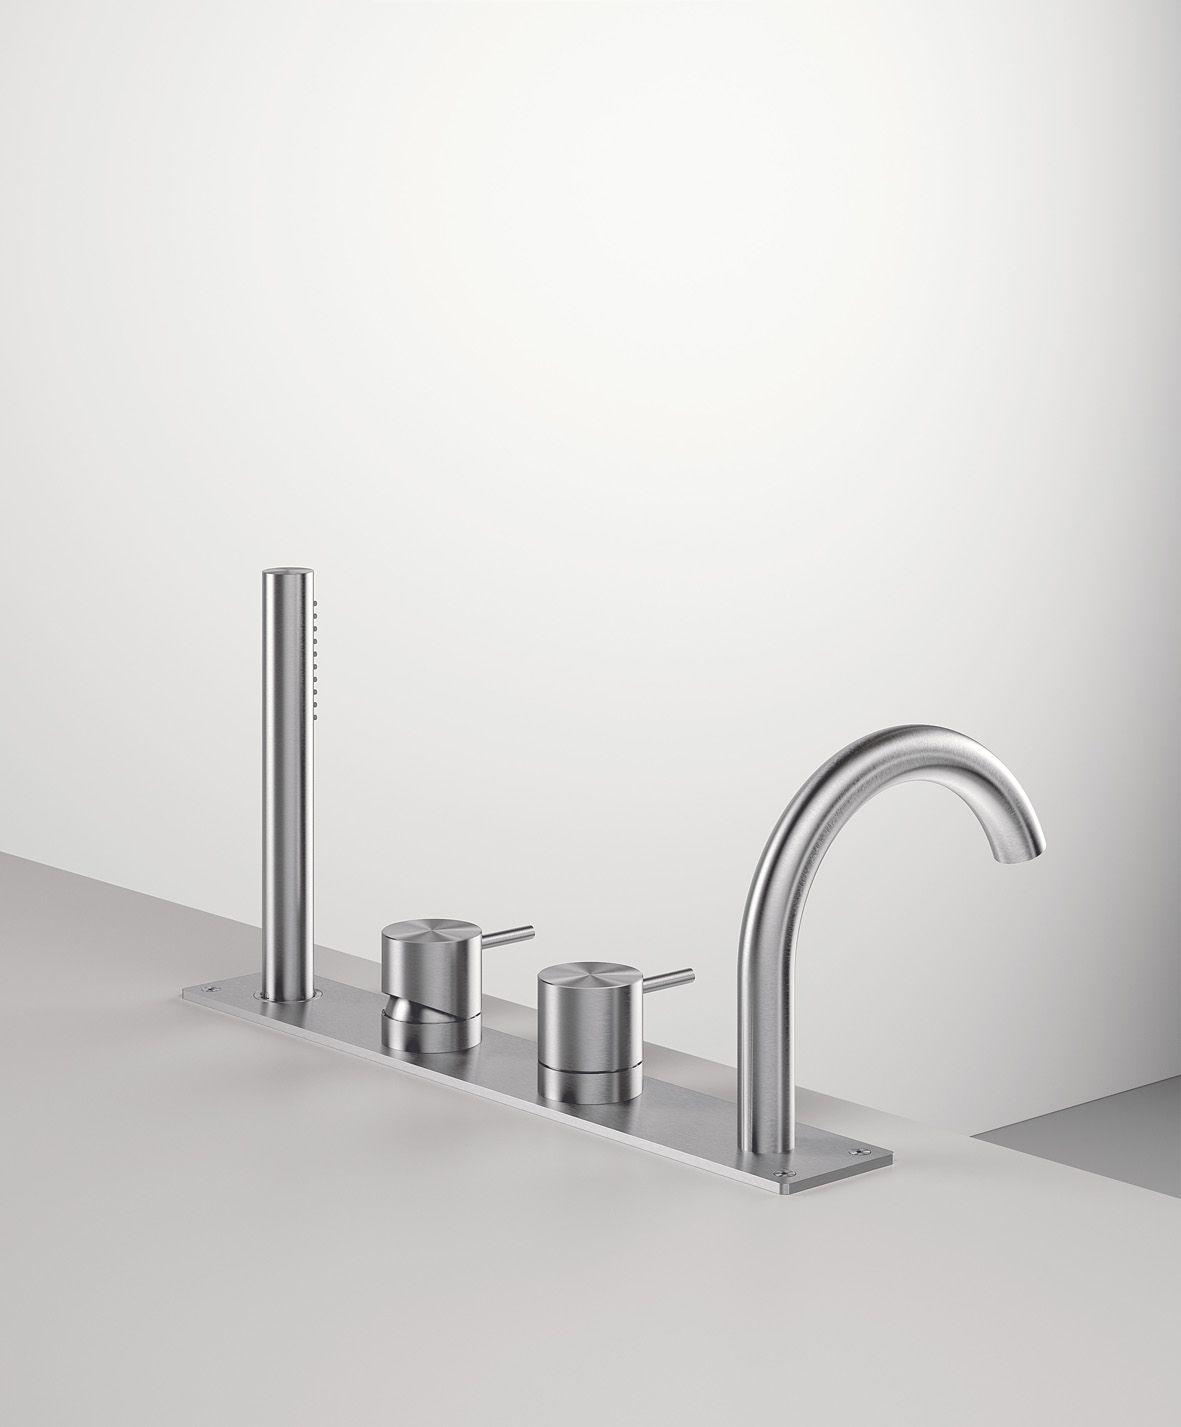 Zazzeri Z316 Collection_Gruppo vasca 4 fori design tap